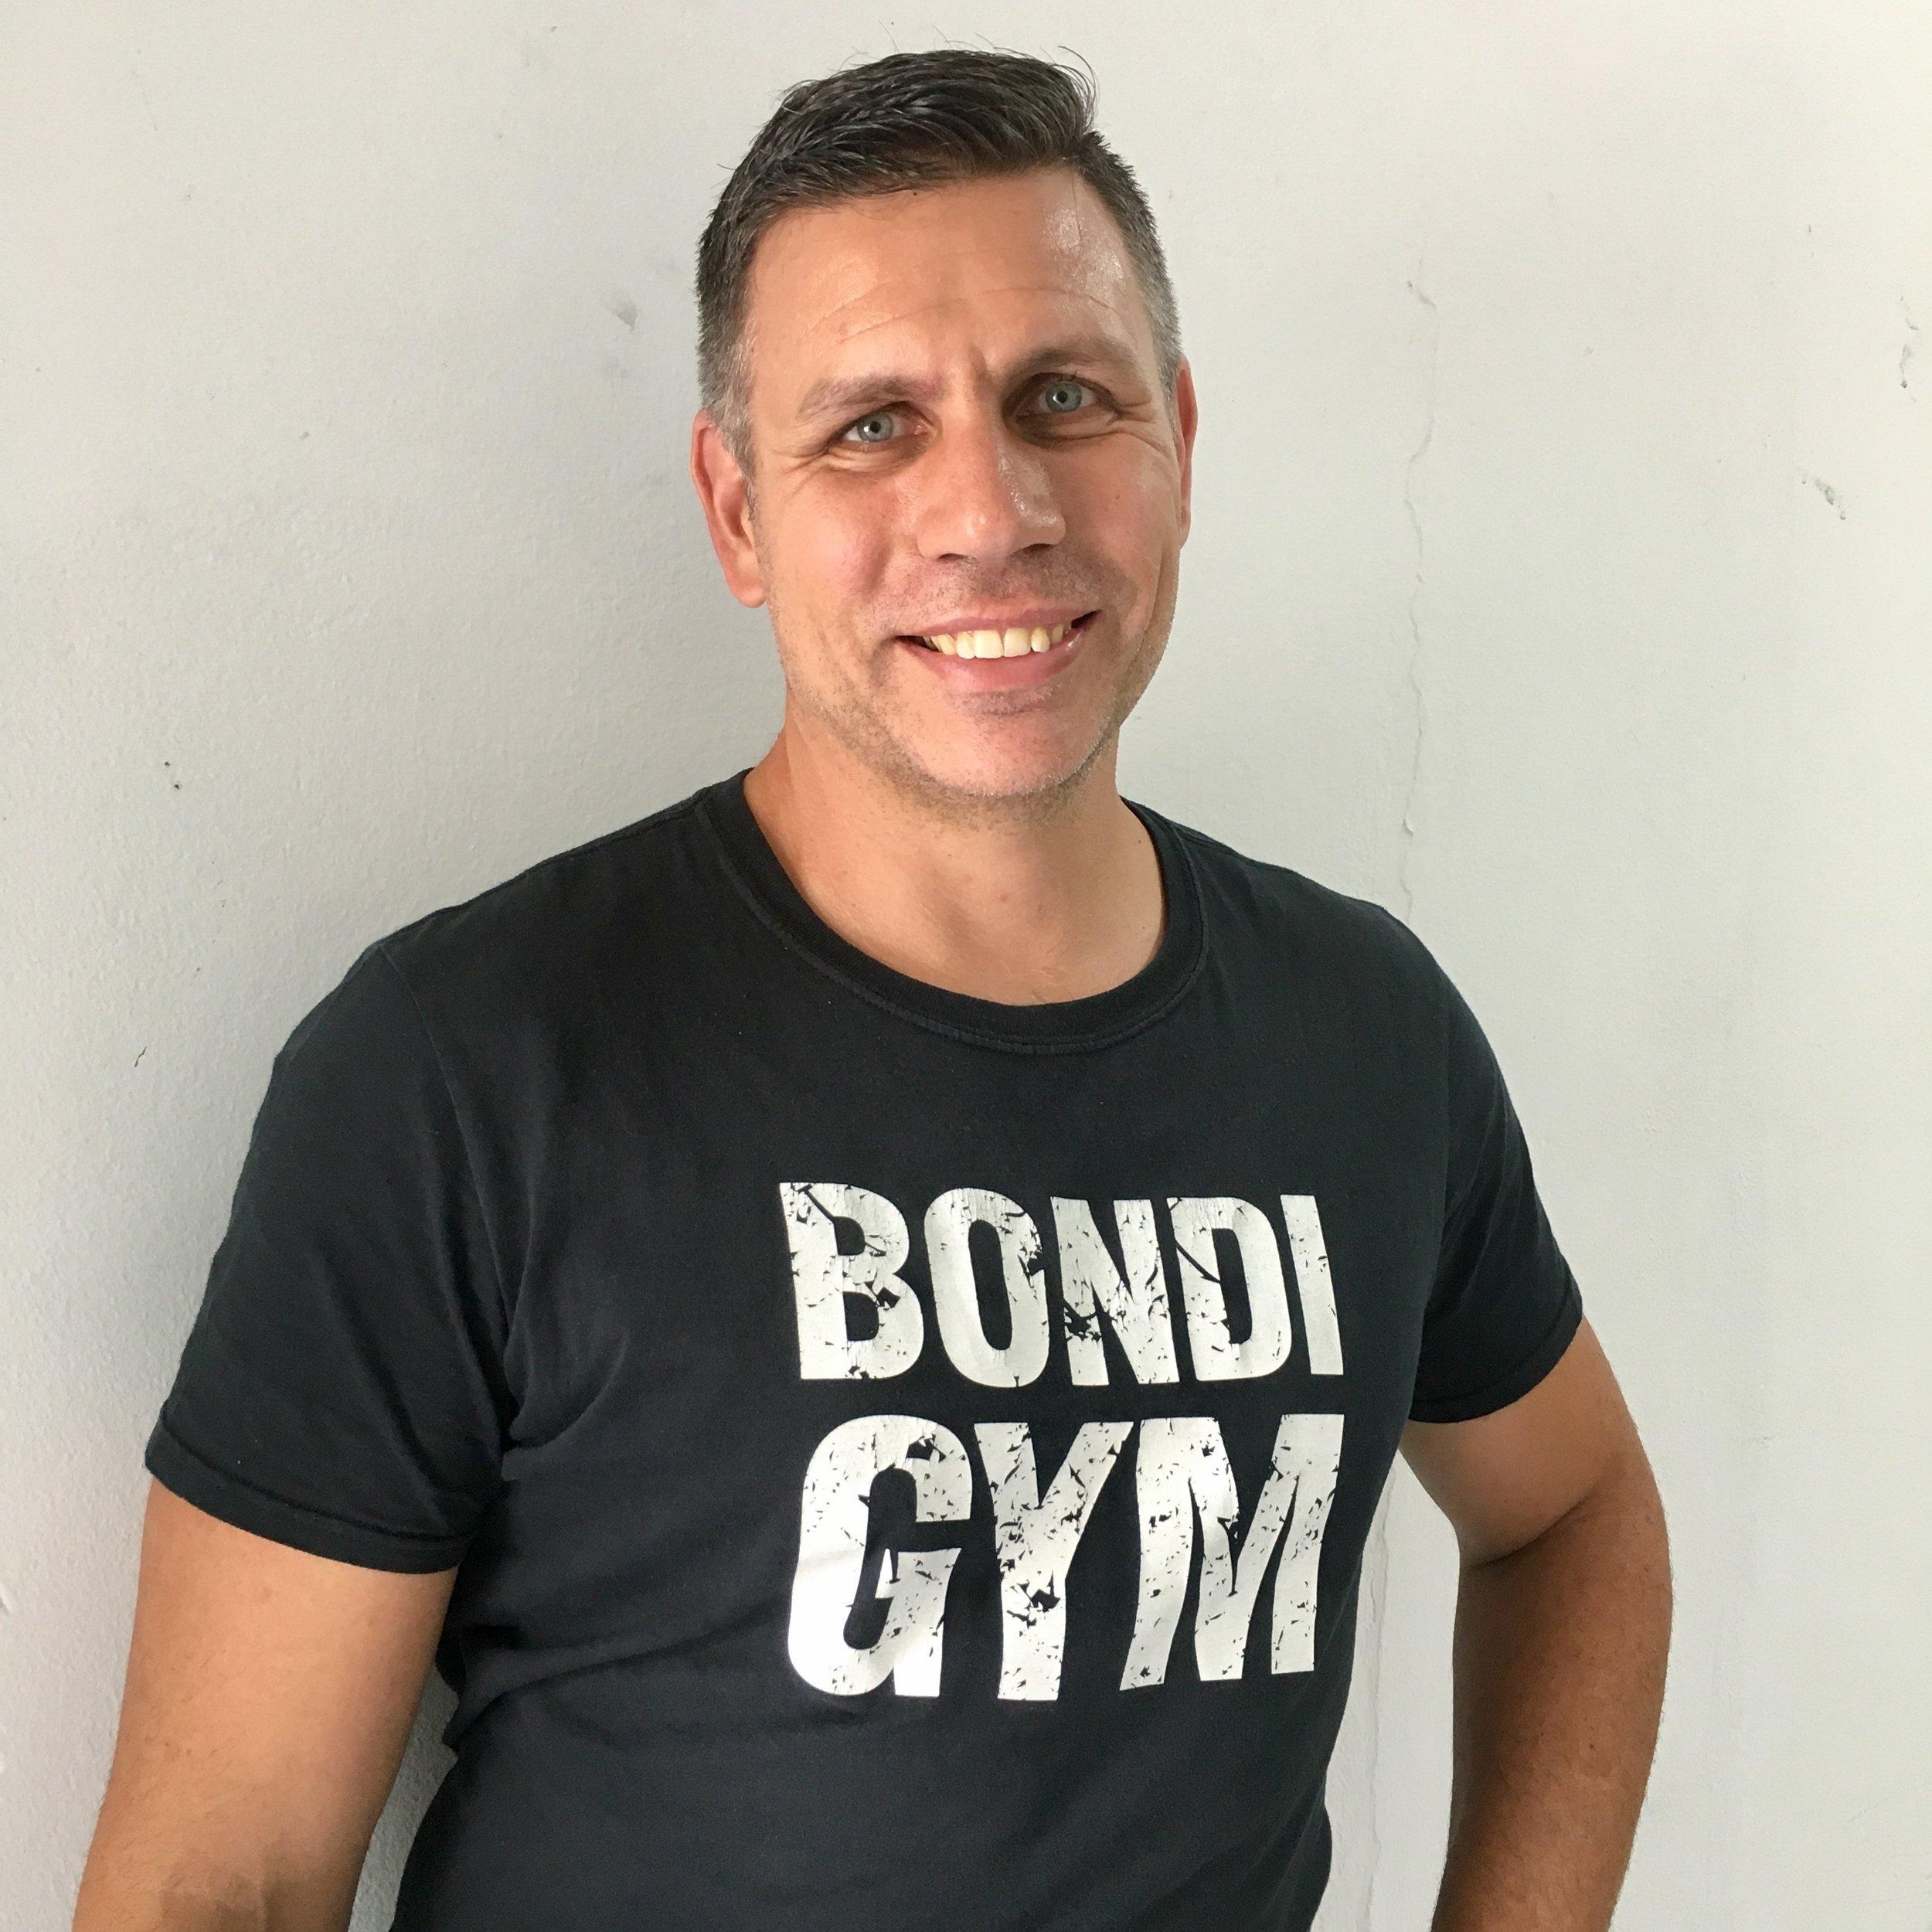 Michael Parker Bondi Gym www.AnnaKooiman.com